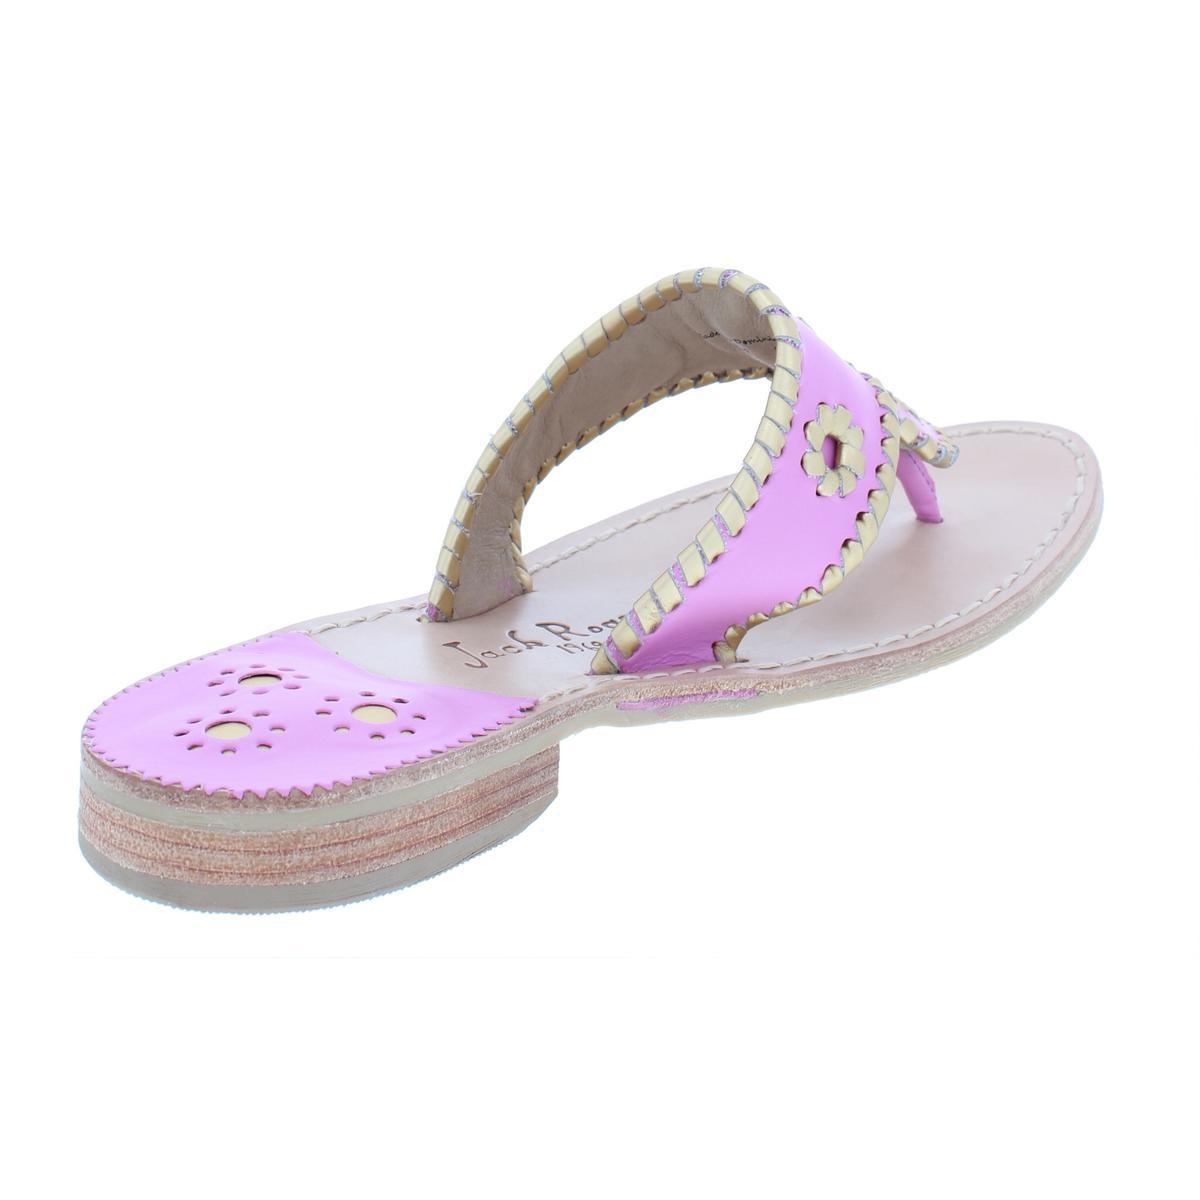 e7905d9eddf6 Jack Rogers Womens Hollis Metallic Leather Thong Flip-Flops Sandals ...